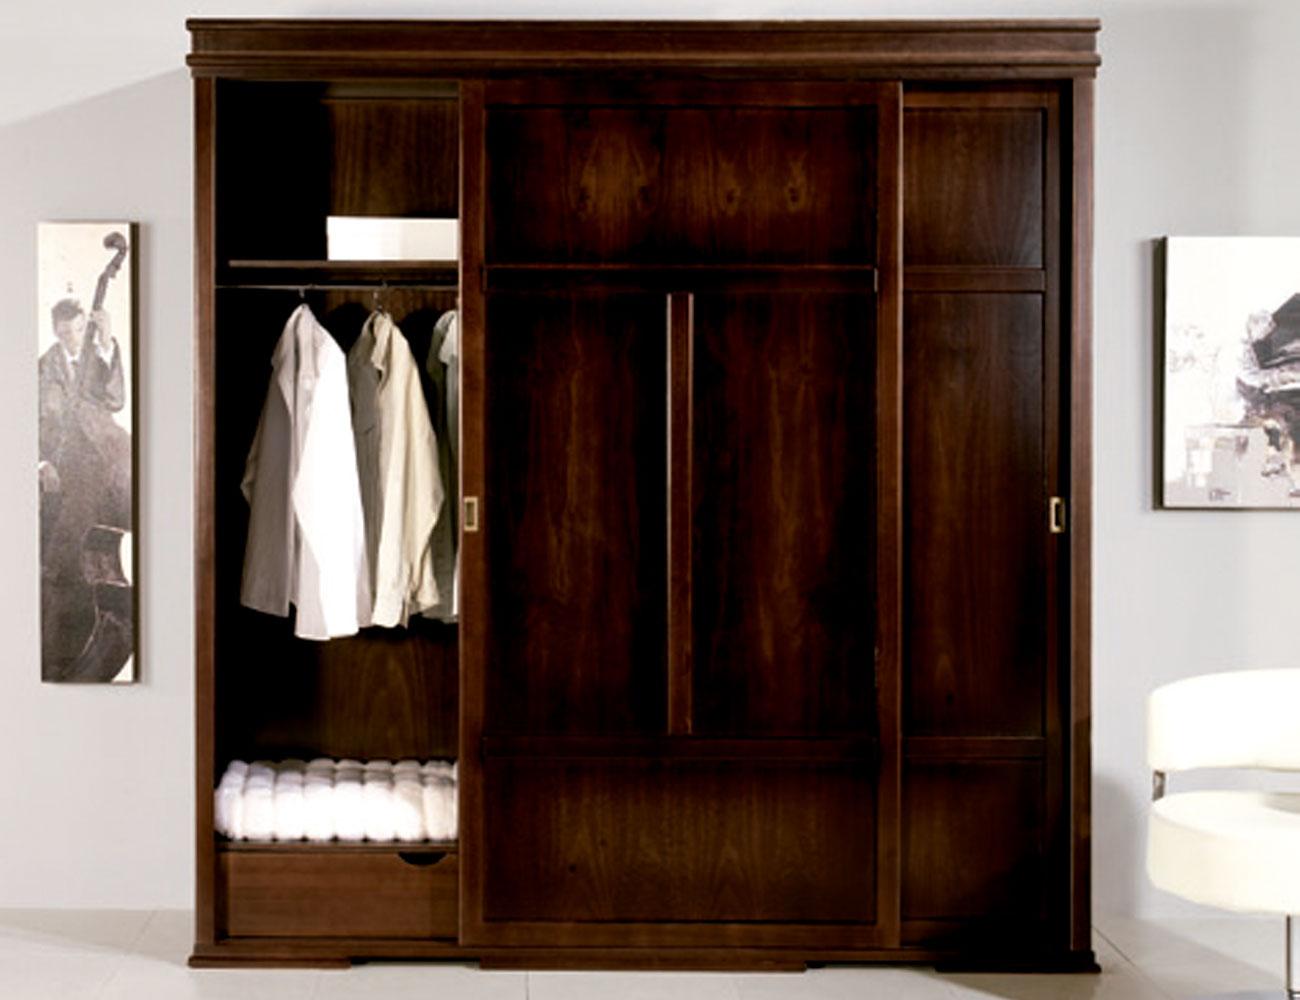 A 40 armario corredera detalle interior2